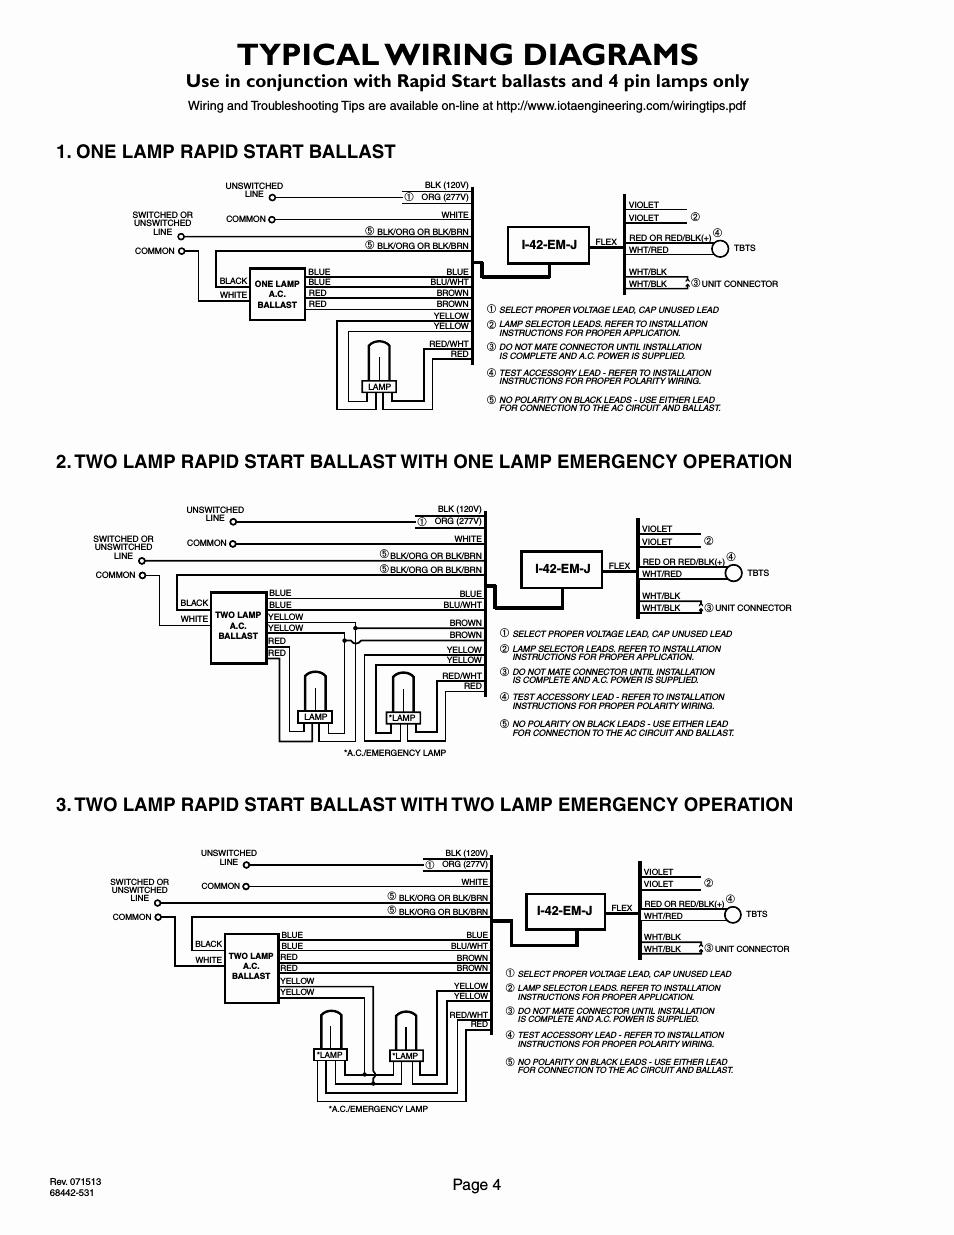 medium resolution of iota emergency ballast wiring diagram iota emergency ballast wiring diagram full size wiring diagram philips